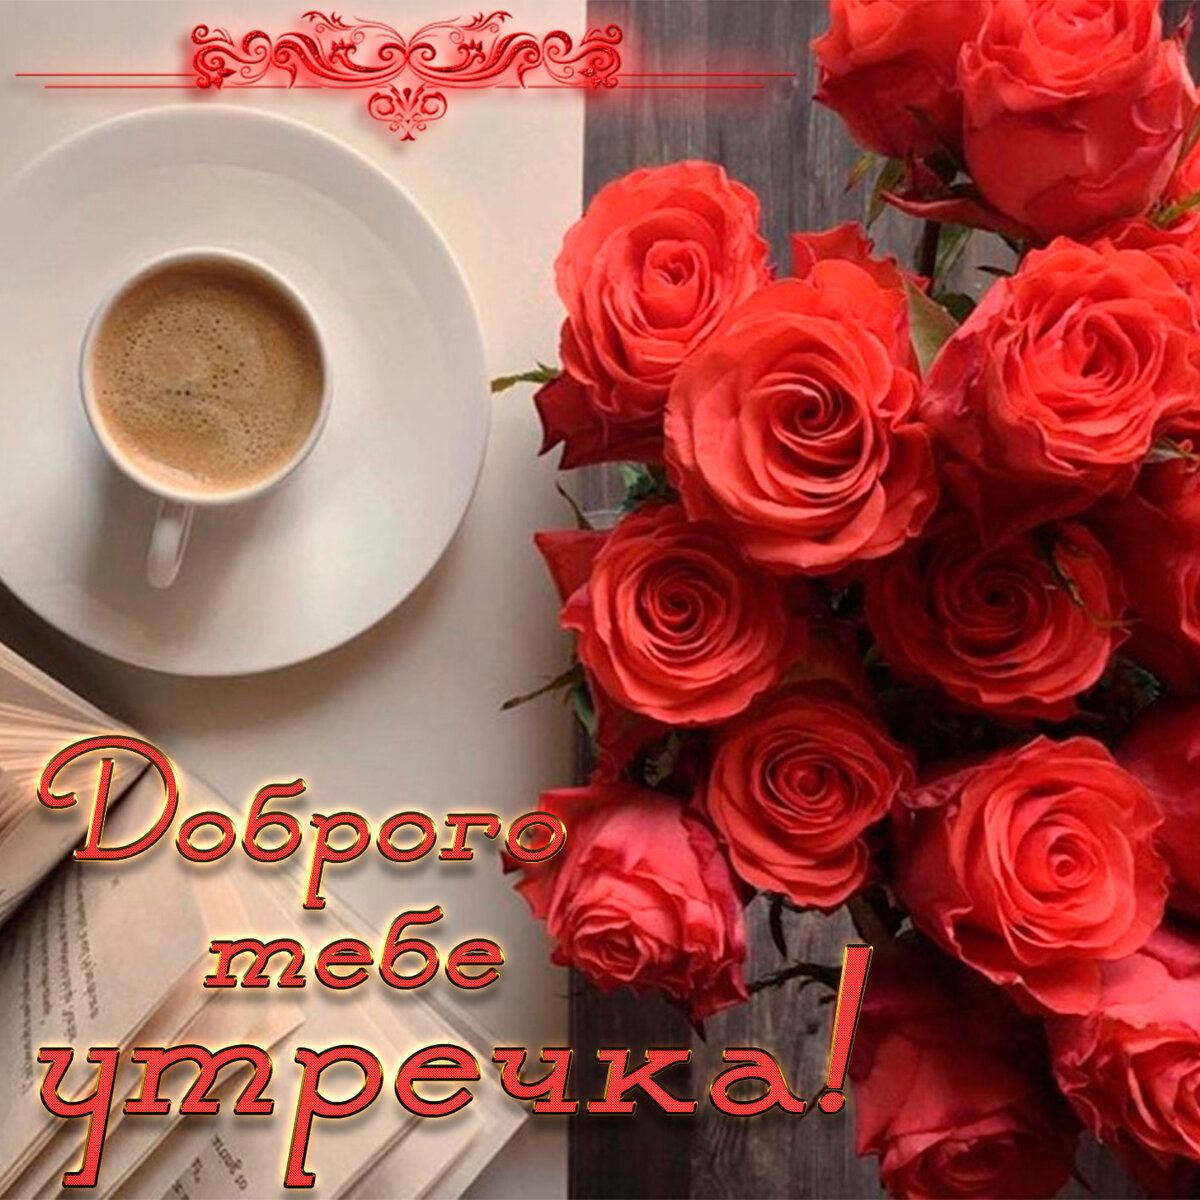 картинки с розами пожеланием доброго утра постоянно